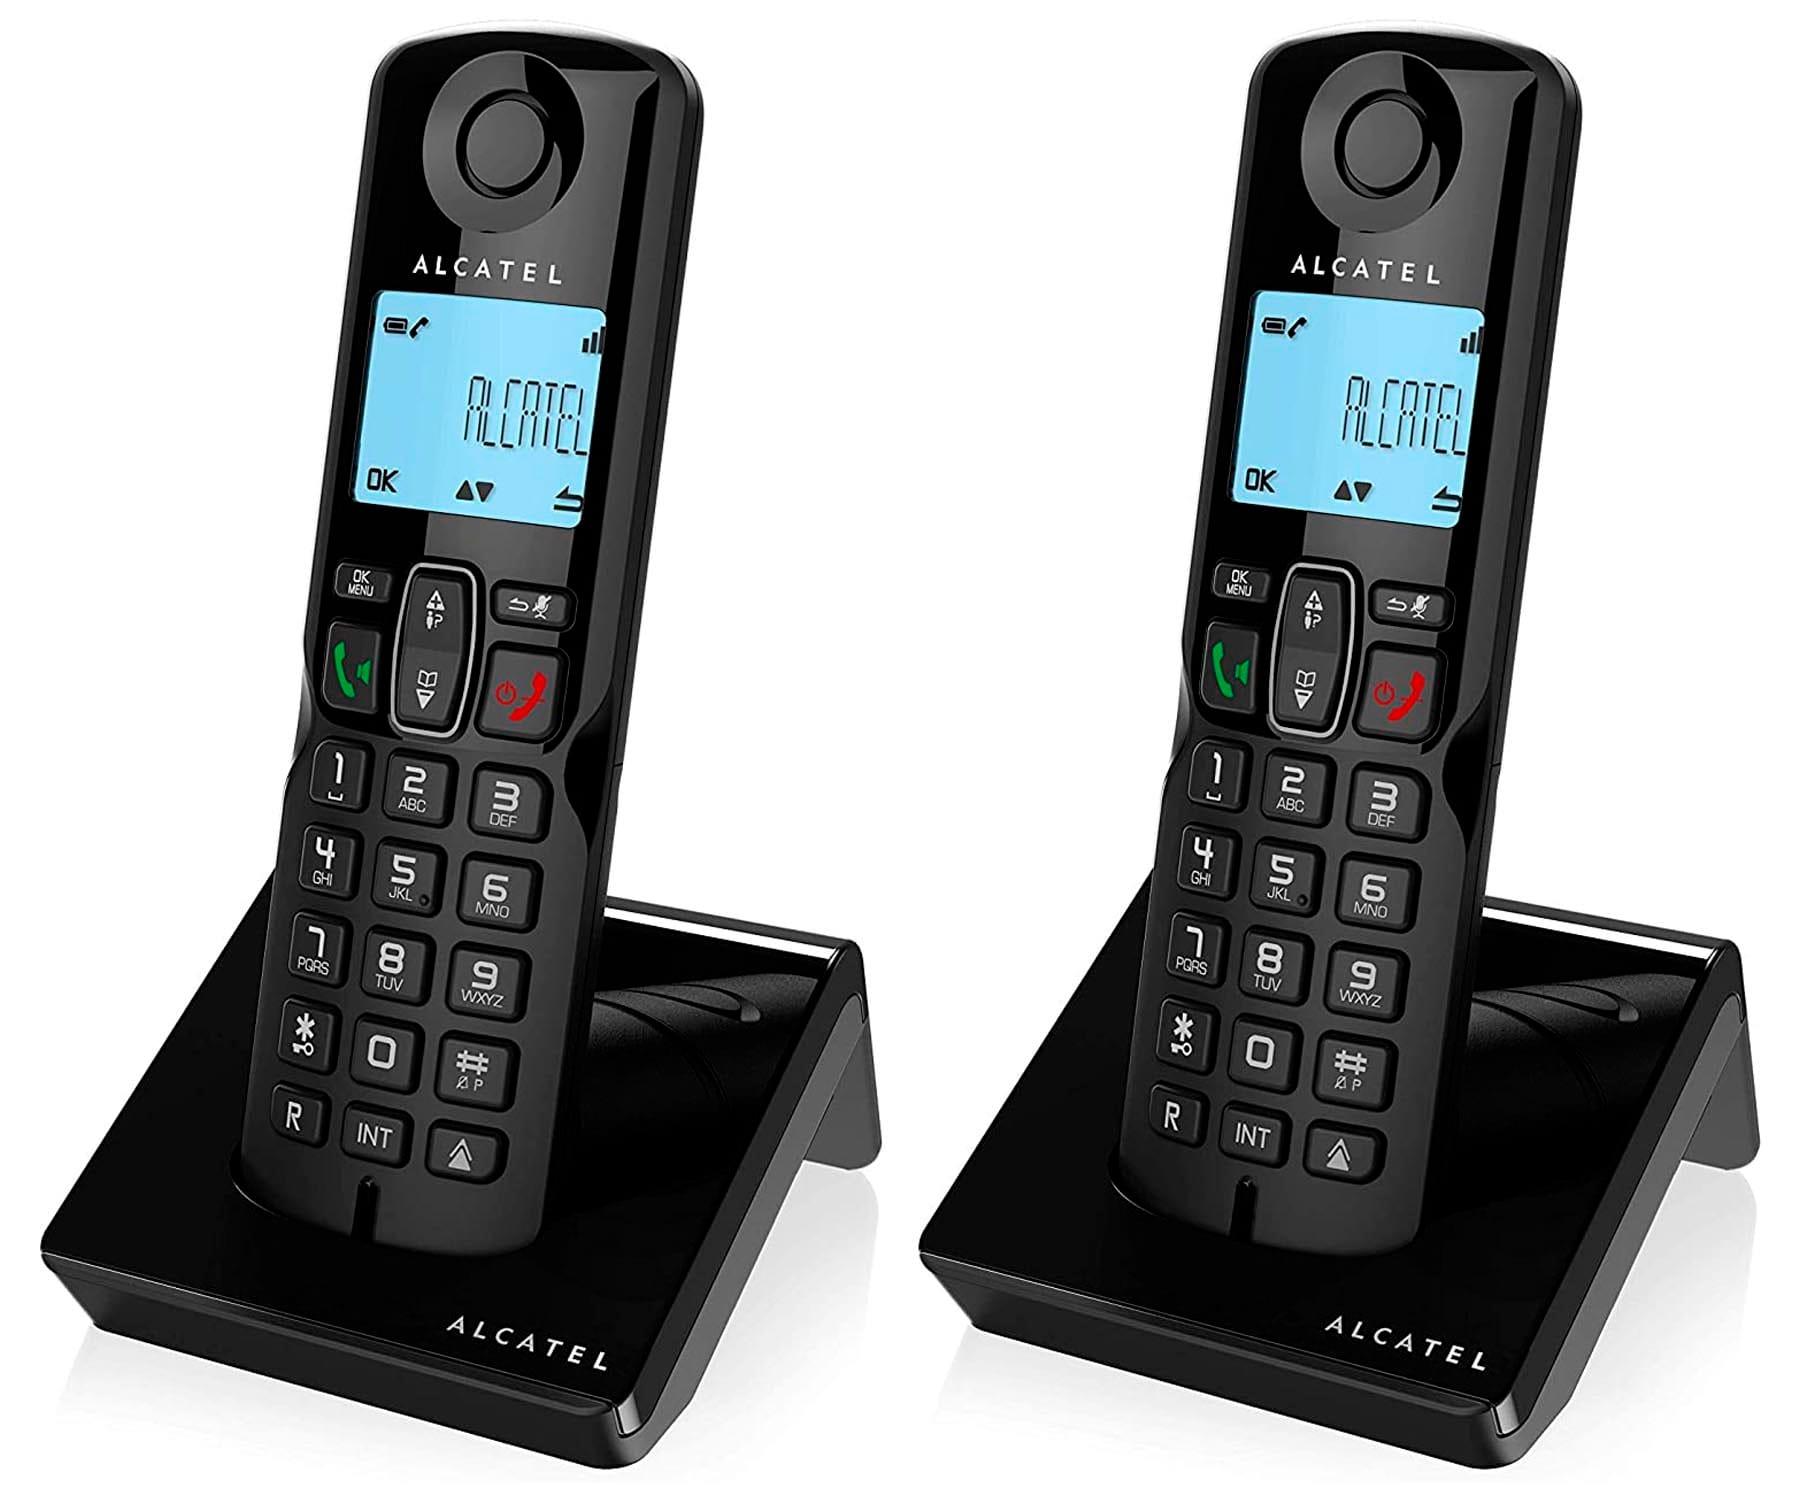 ALCATEL S250 NEGRO DUO TELÉFONOS FIJOS INALÁMBRICOS PANTALLA RETROILUMINADA BLOQUEO DE LLAMADAS